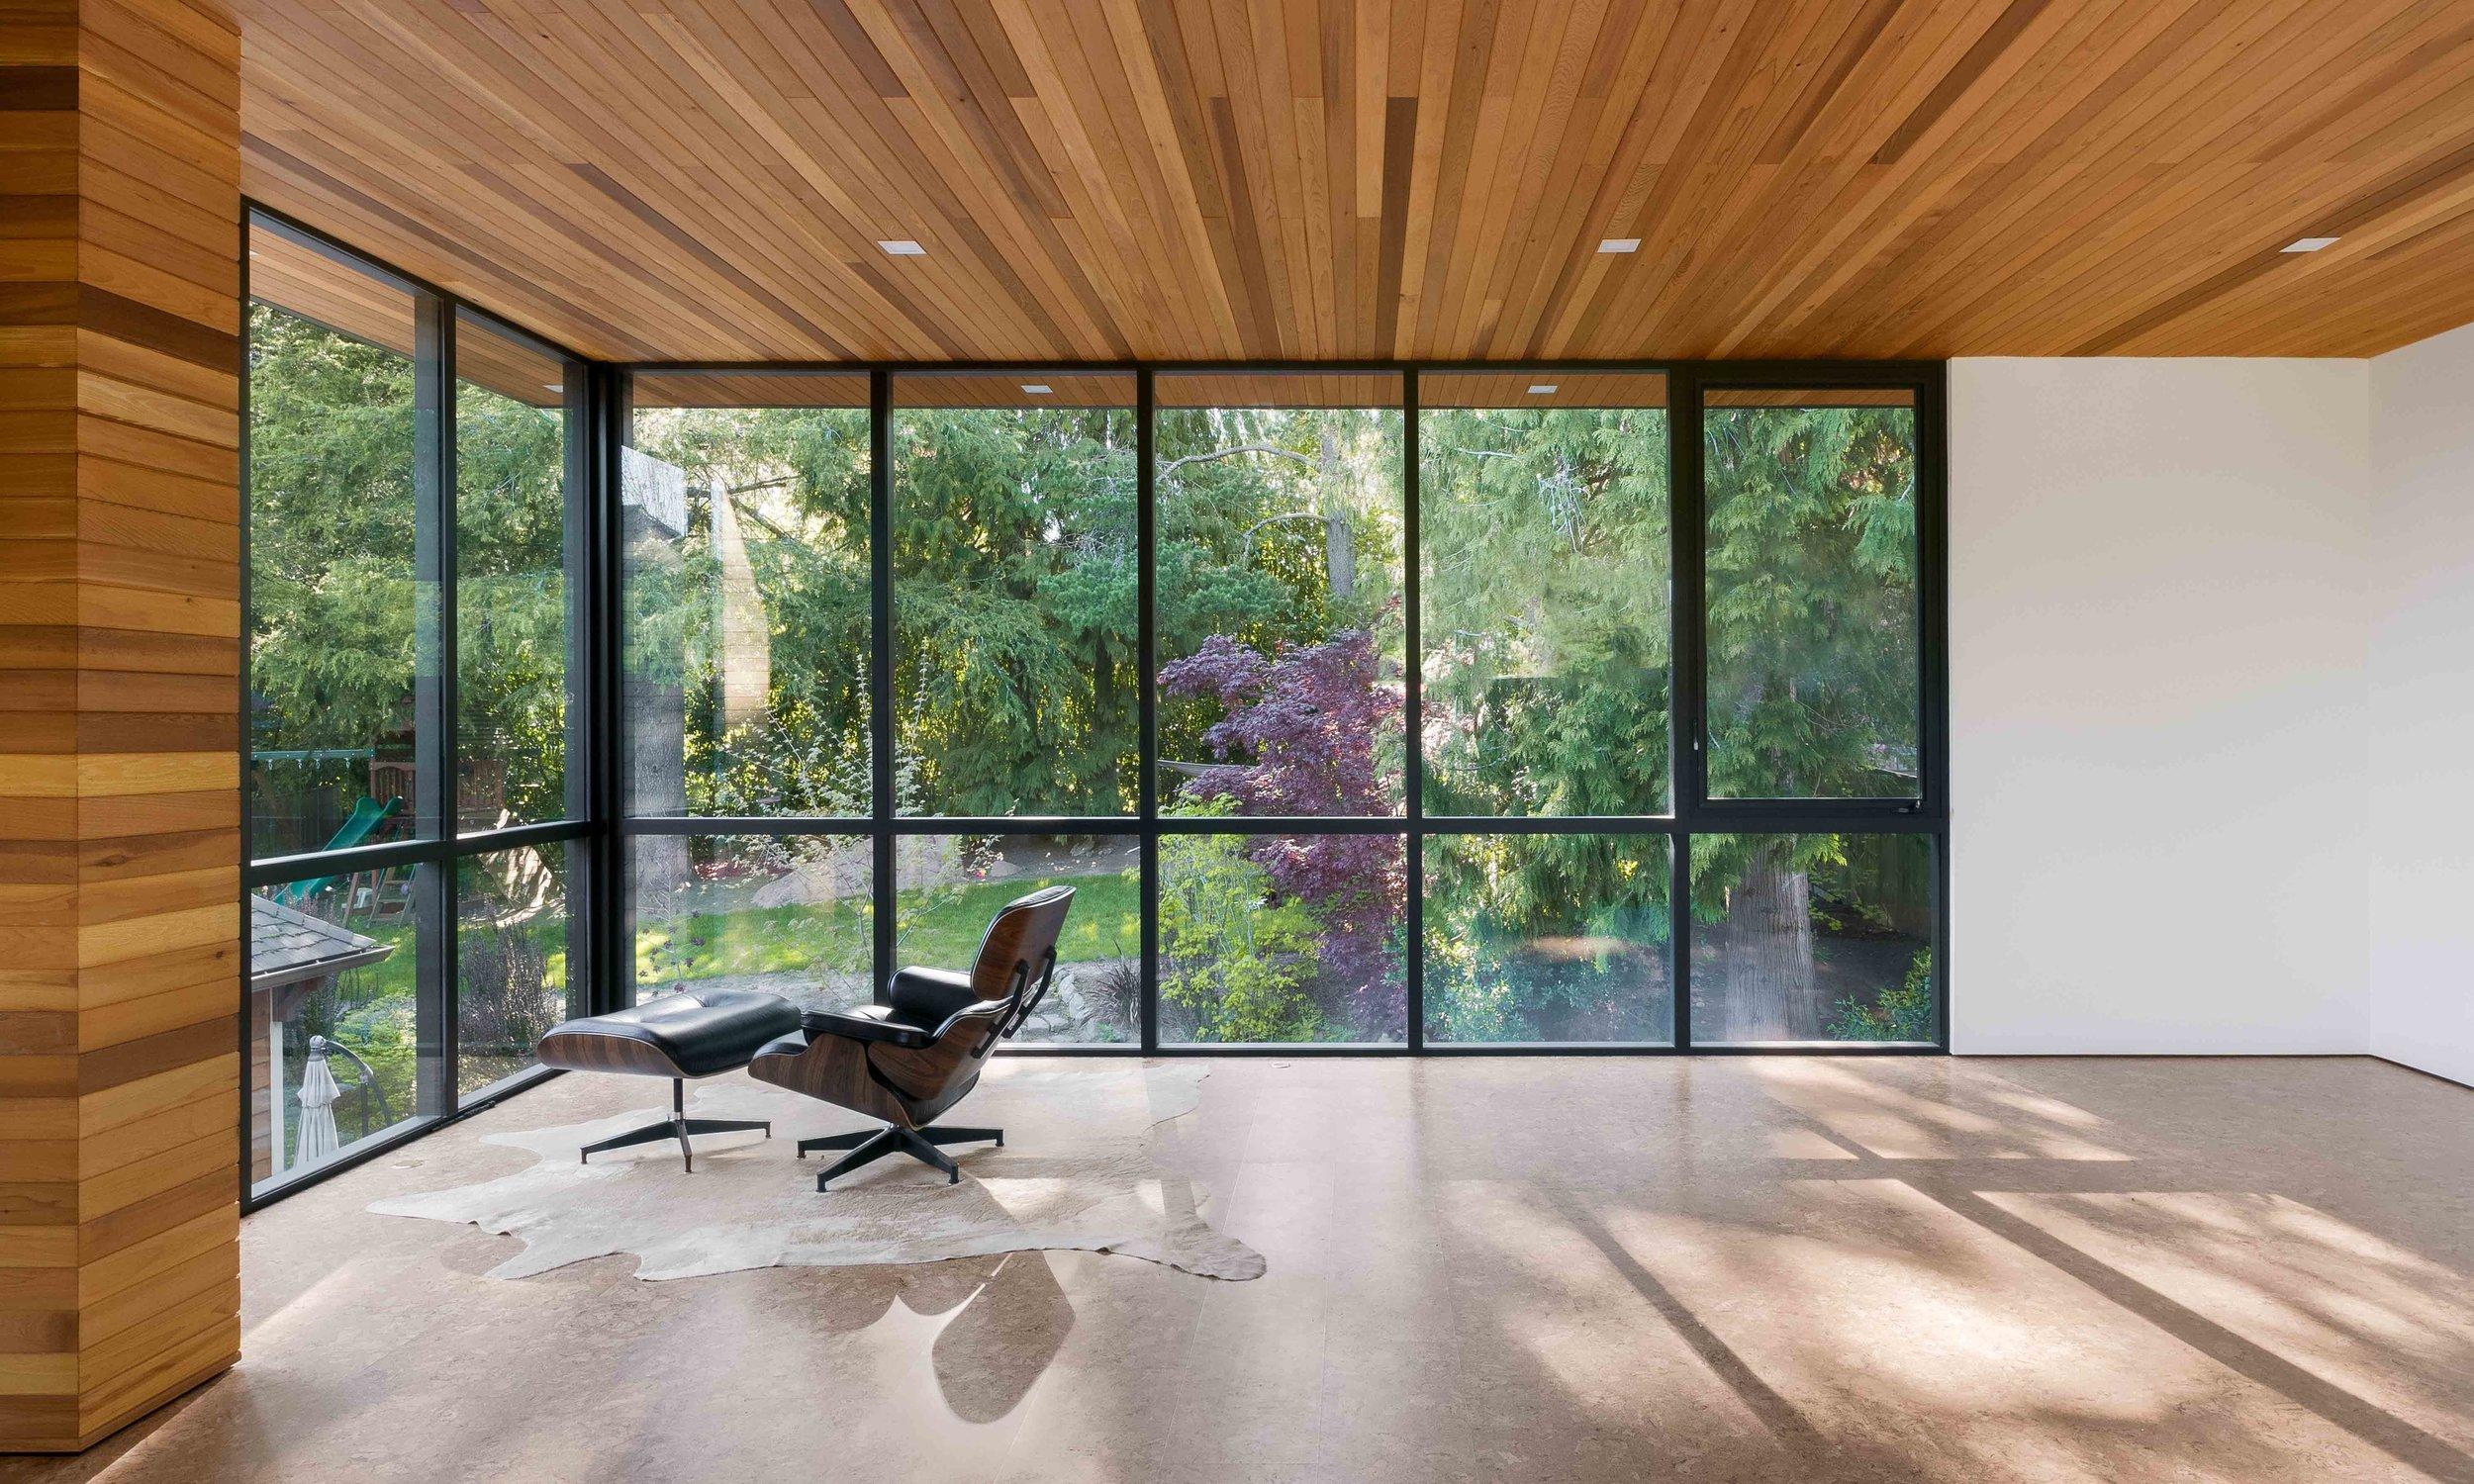 A northwest modern family room that overlooks the backyard garden.